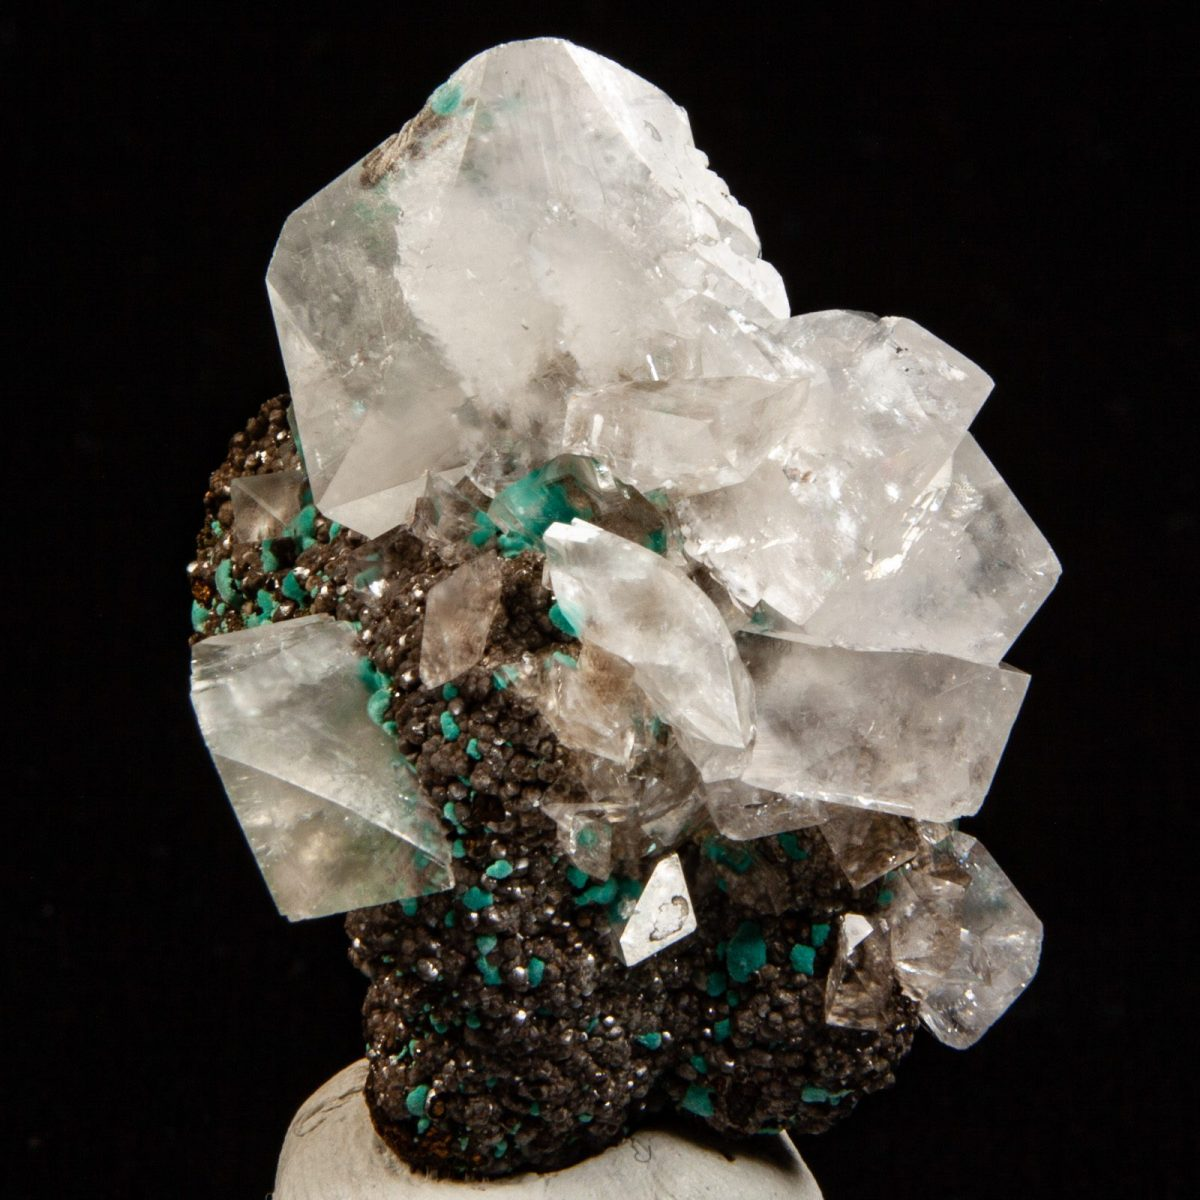 Calcite with Rosasite